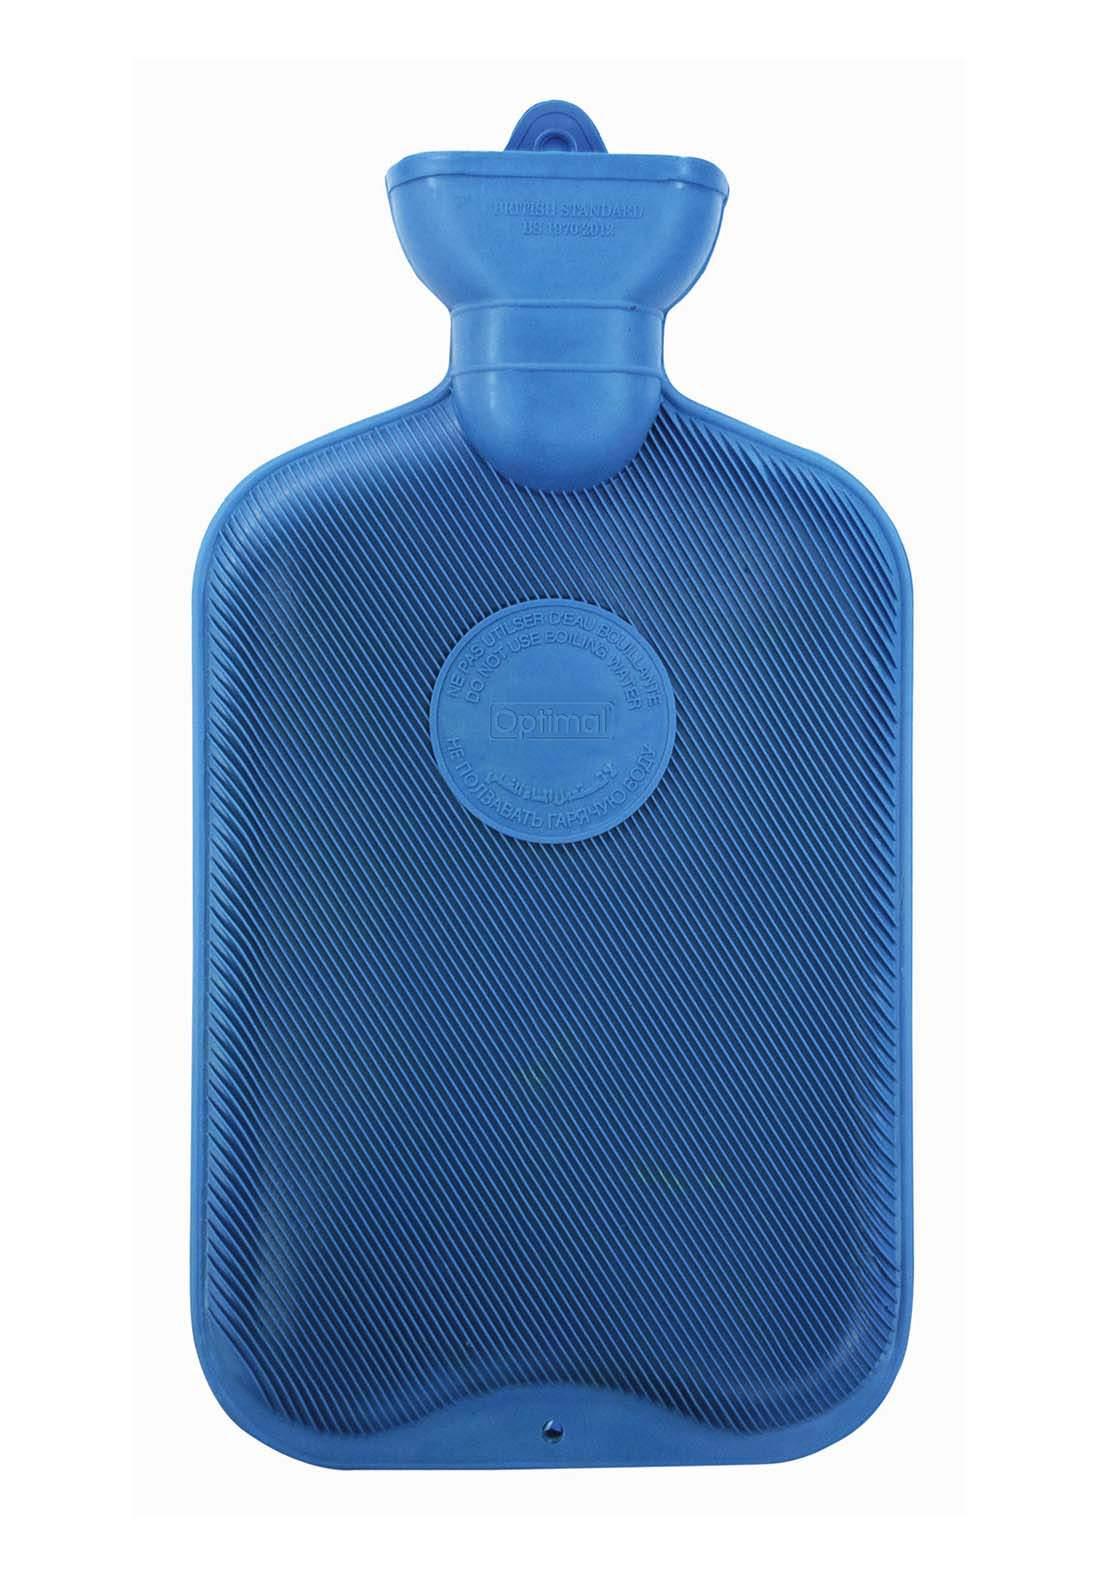 Optimal Rubber Hot Water Bag كيس ماء ساخن مطاطي